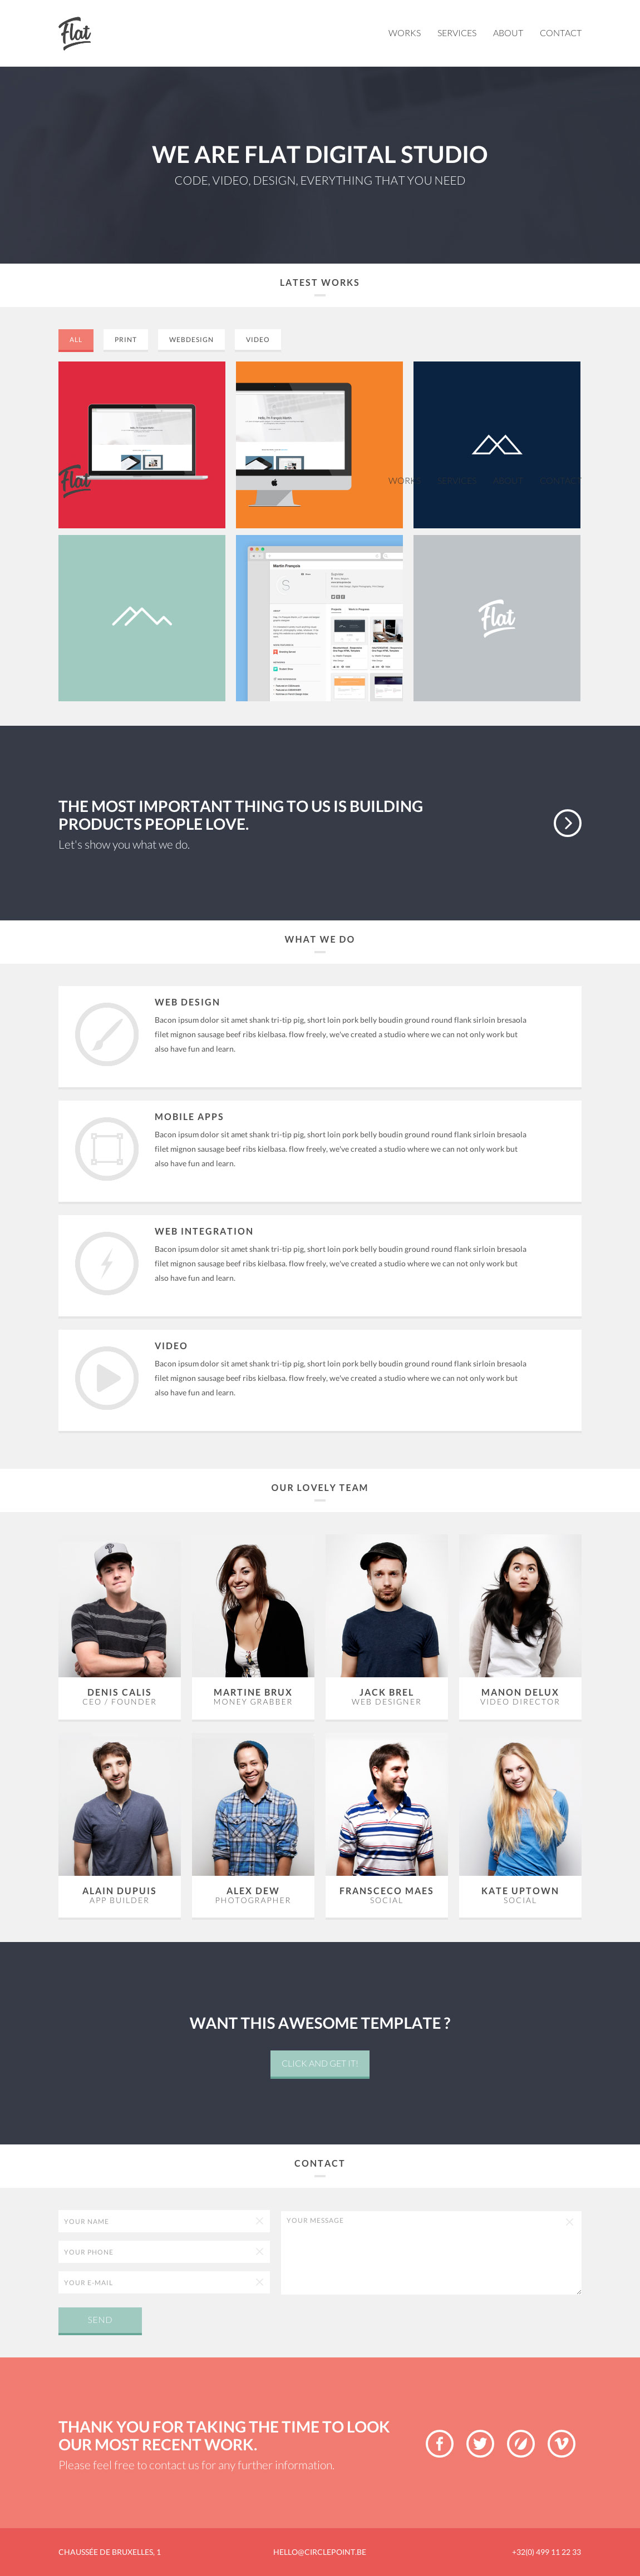 Flat Studio Website Screenshot